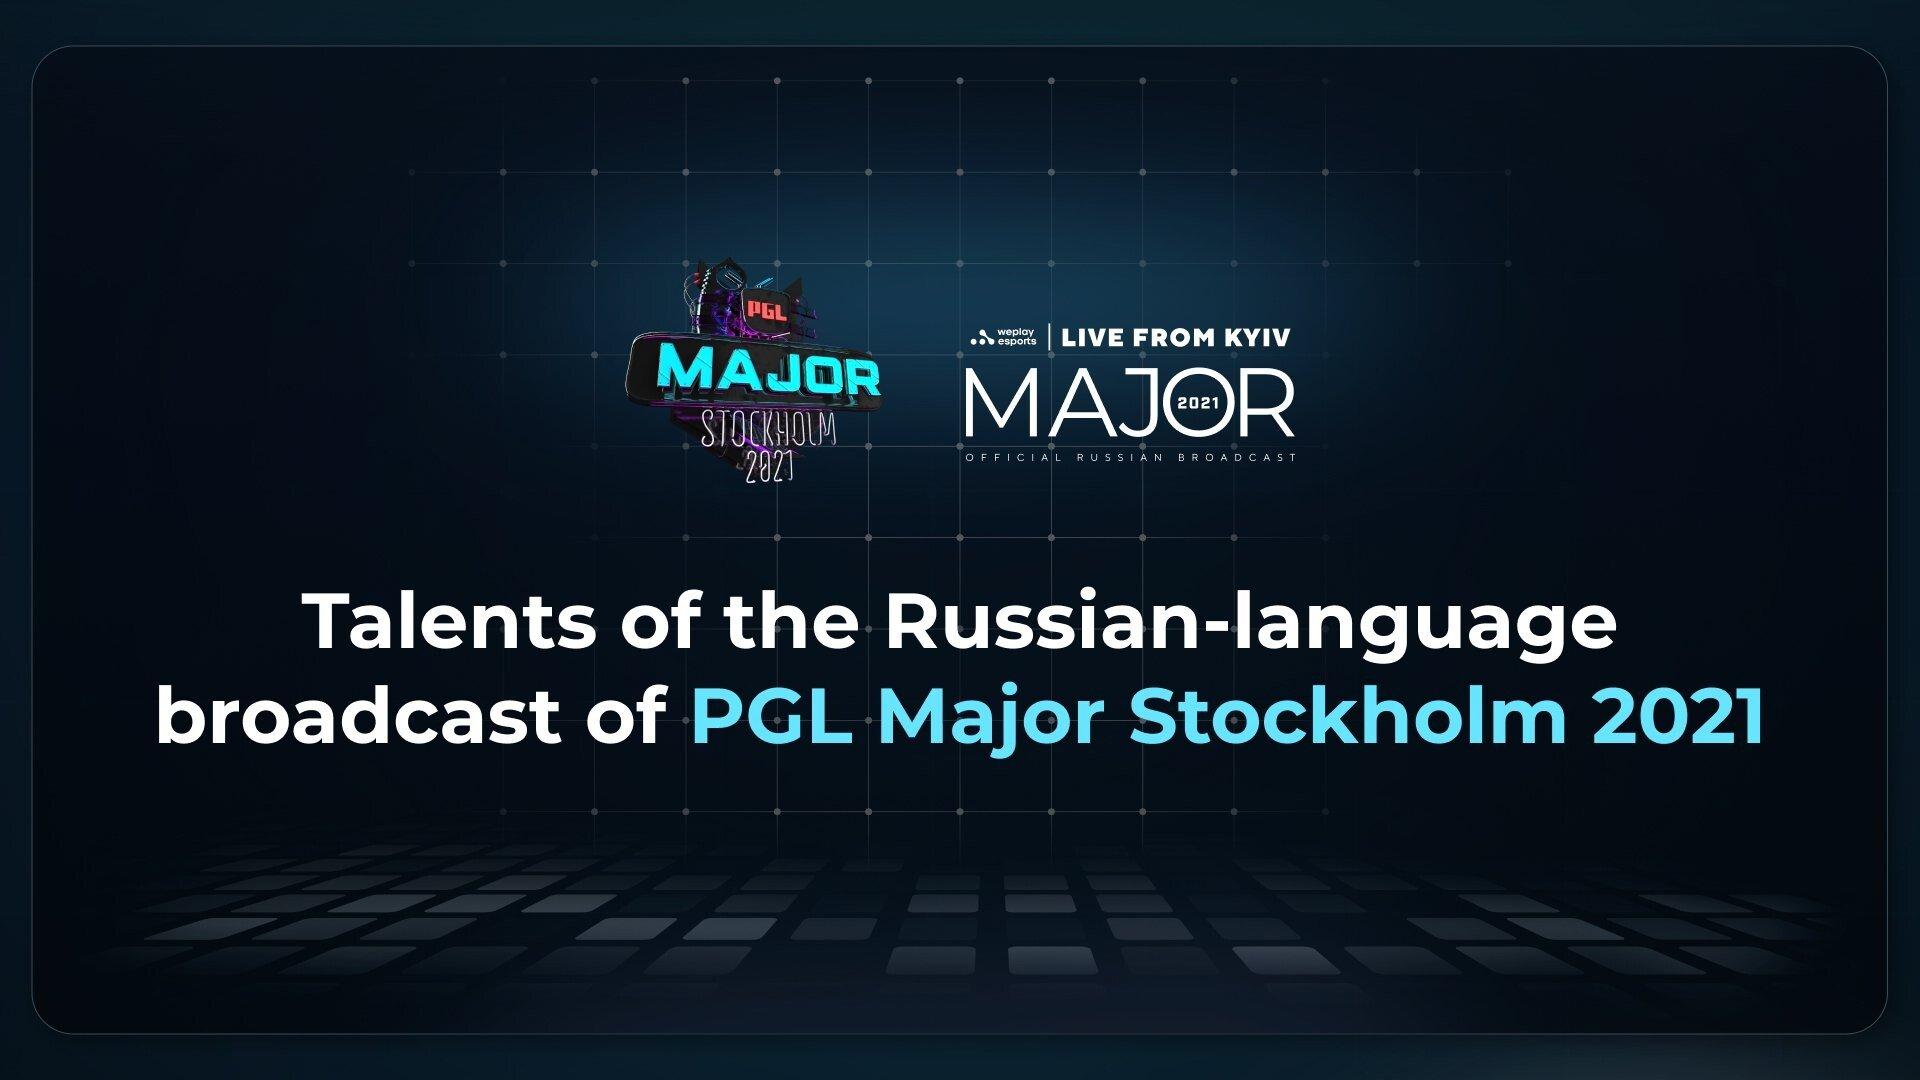 PGL Major Stockholm 2021: Talents of the Russian-language broadcast